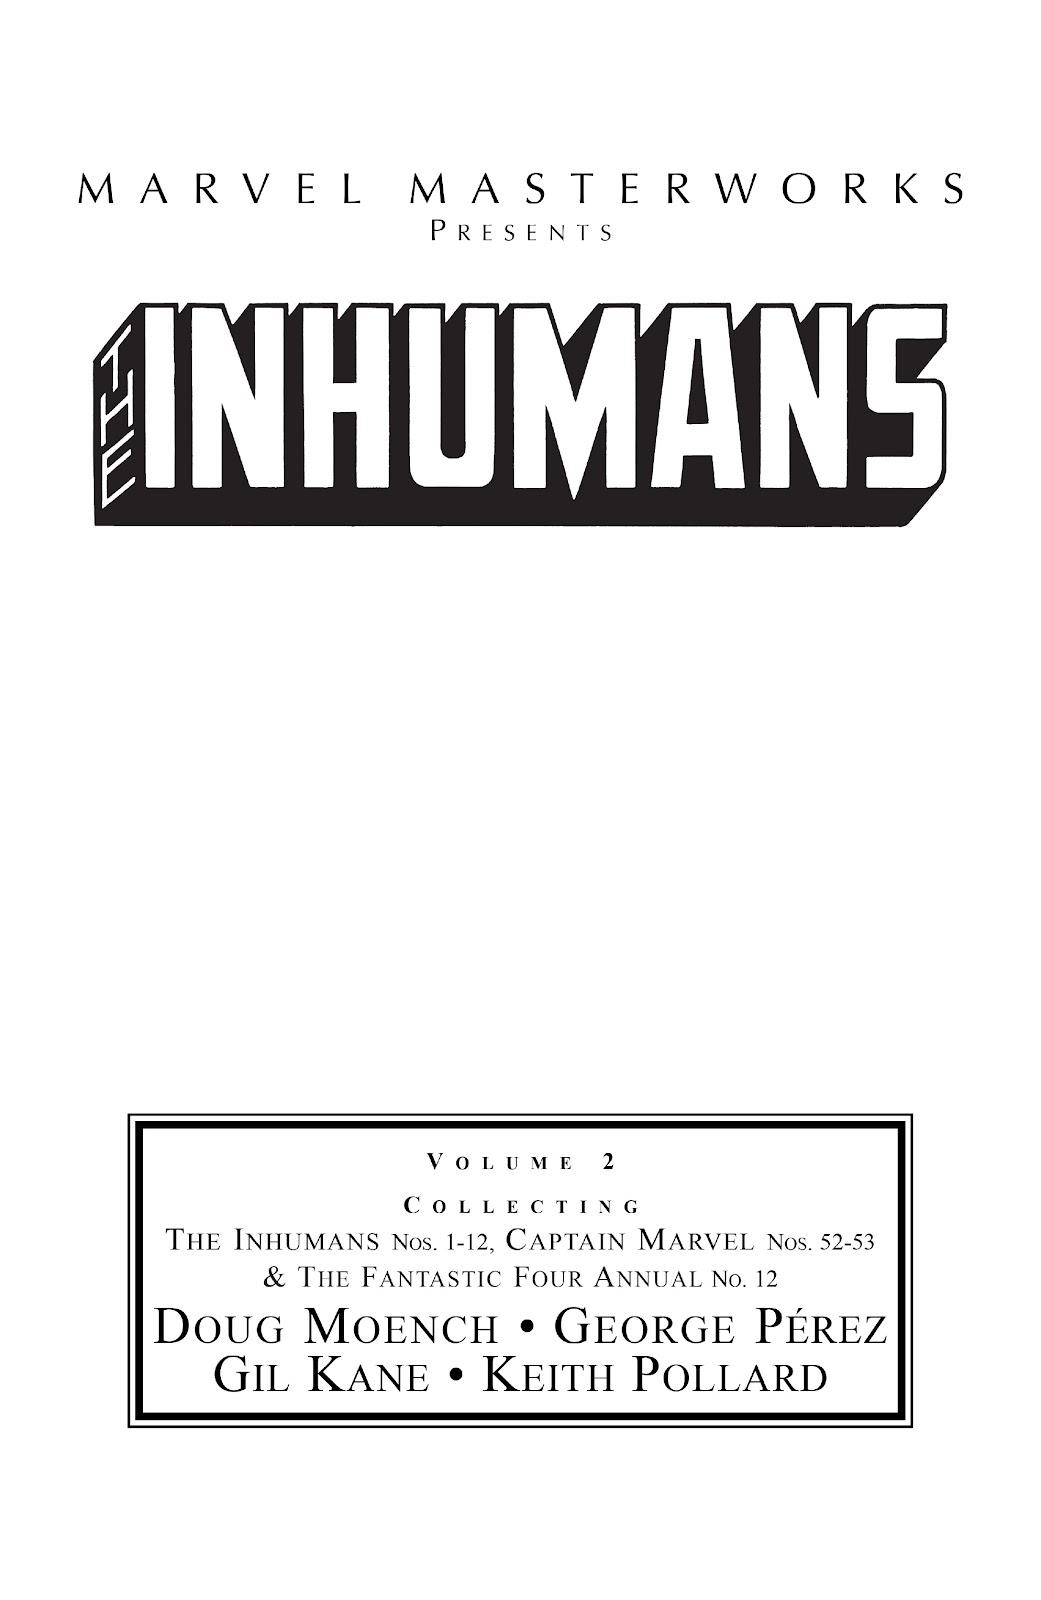 Read online Marvel Masterworks: The Inhumans comic -  Issue # TPB 2 (Part 1) - 2